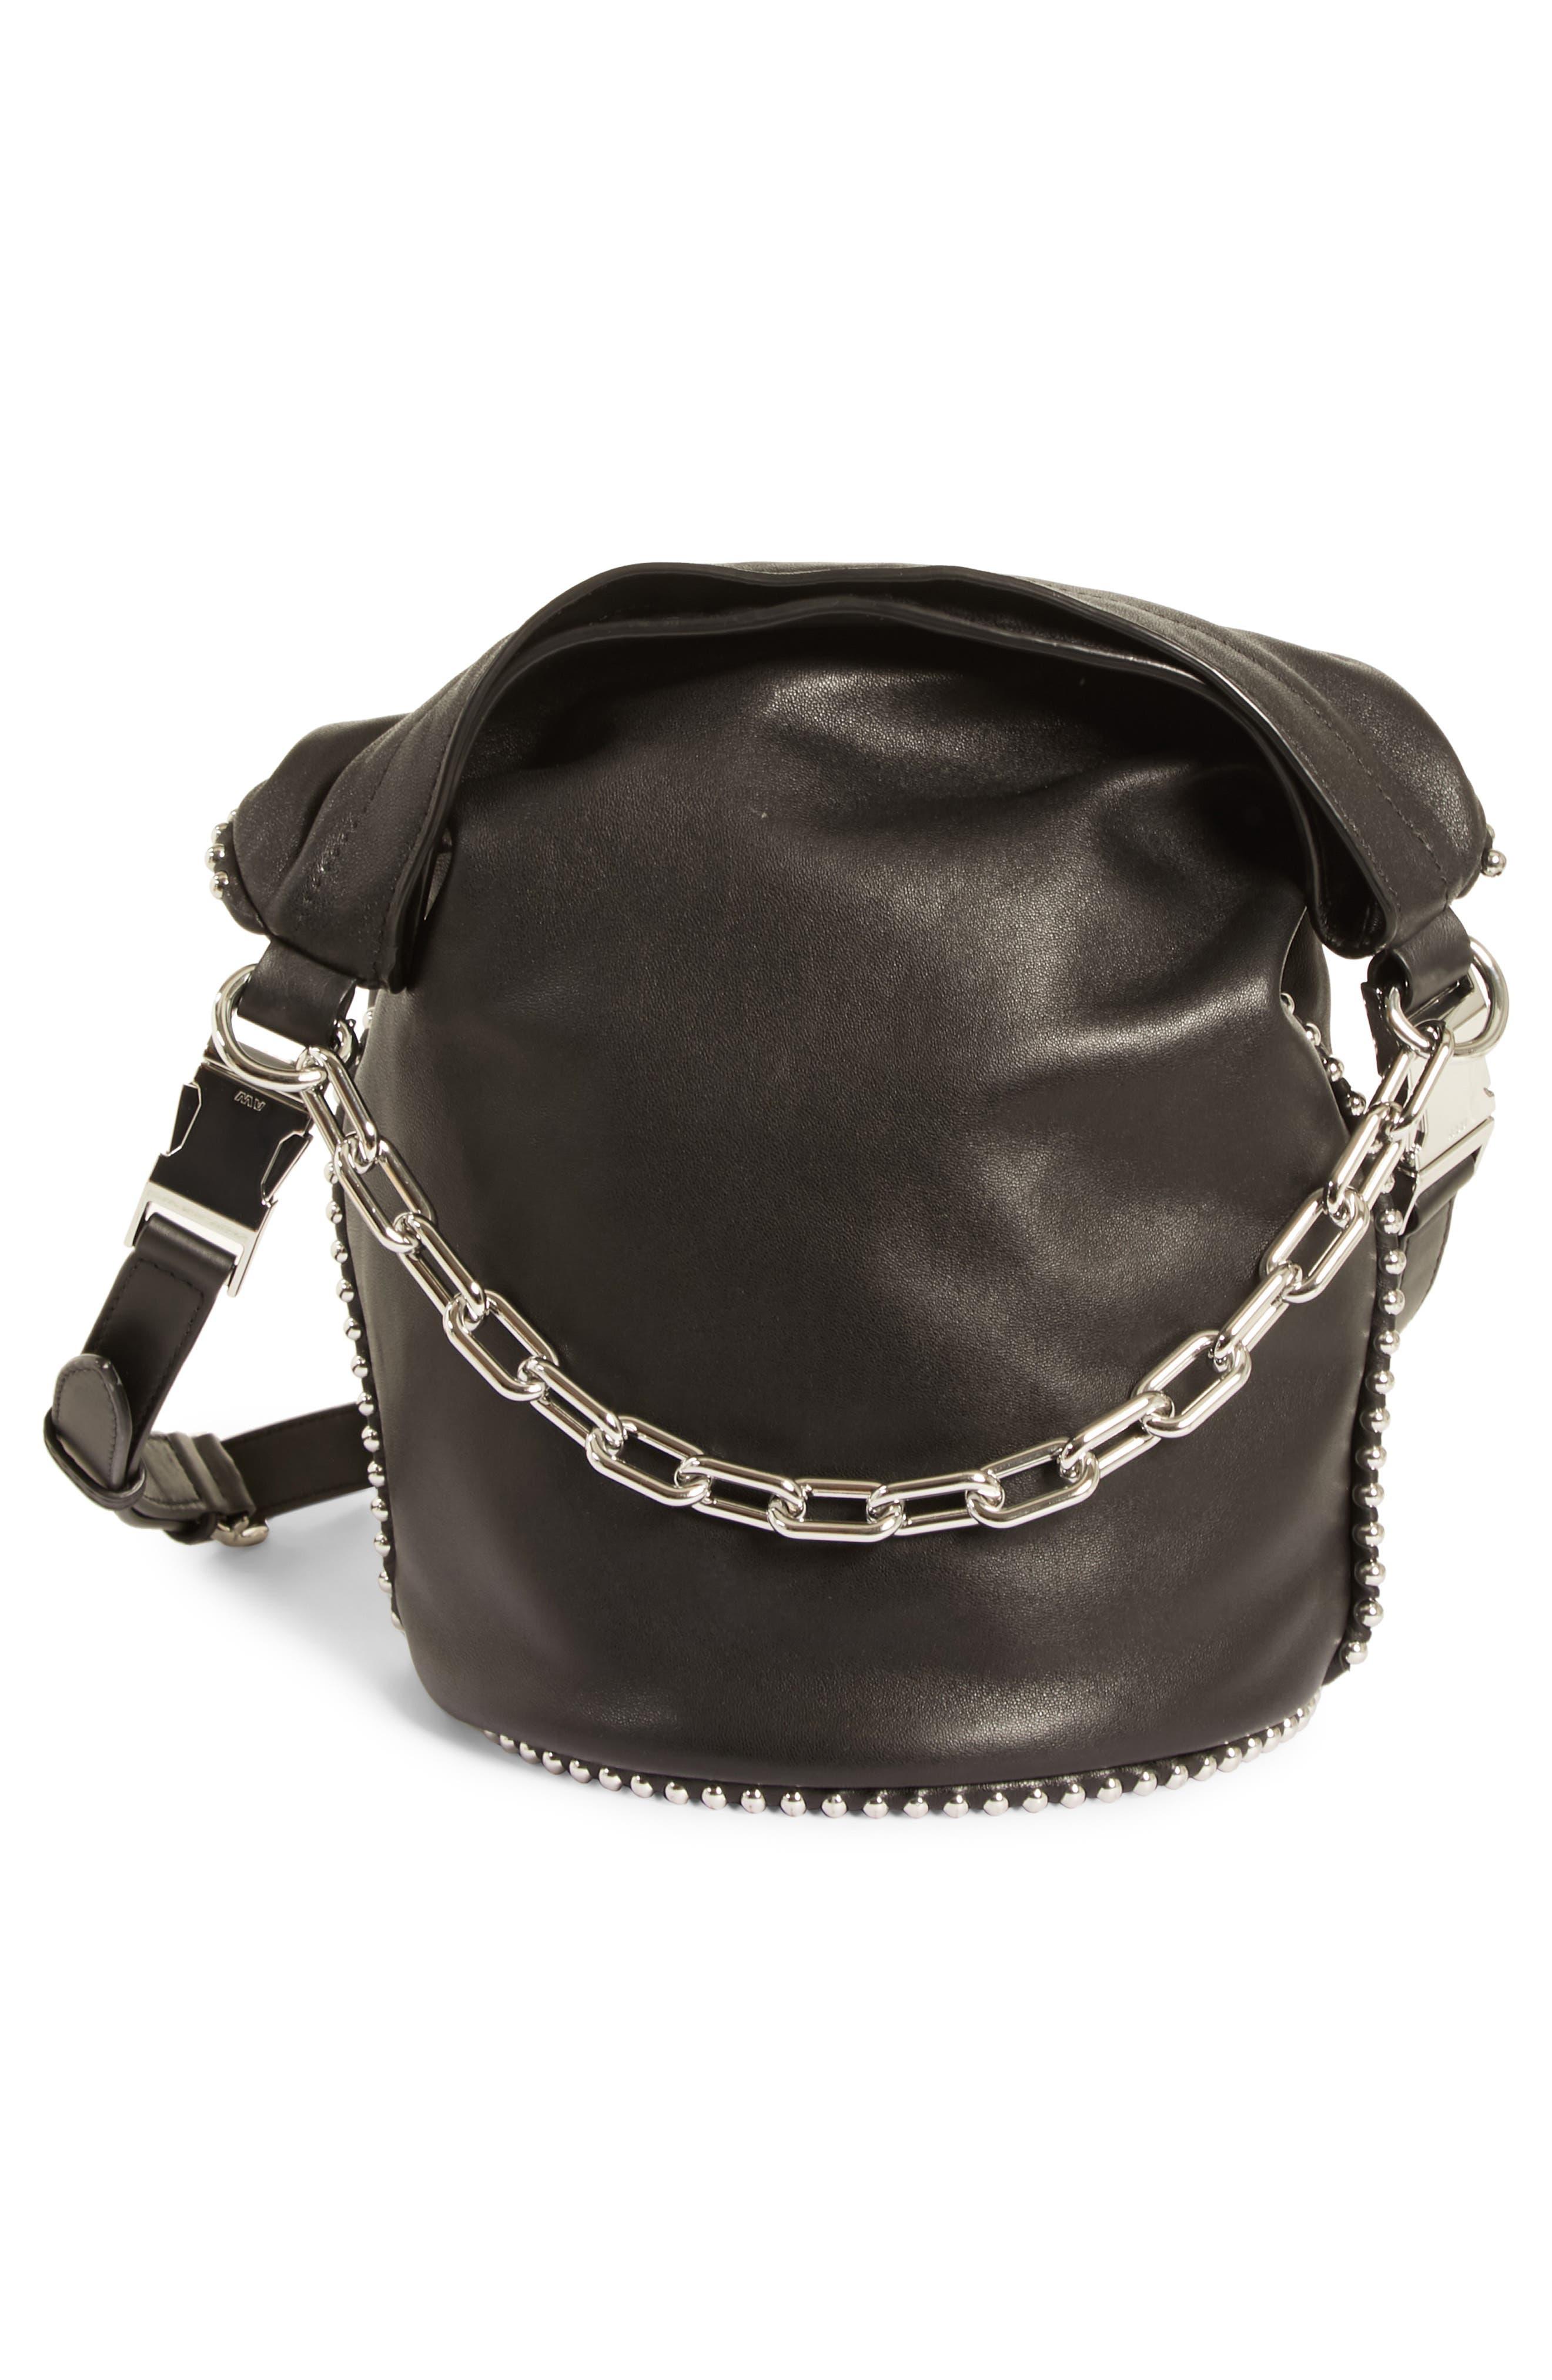 Attica Dry Sack Leather Bucket Bag,                             Alternate thumbnail 3, color,                             BLACK